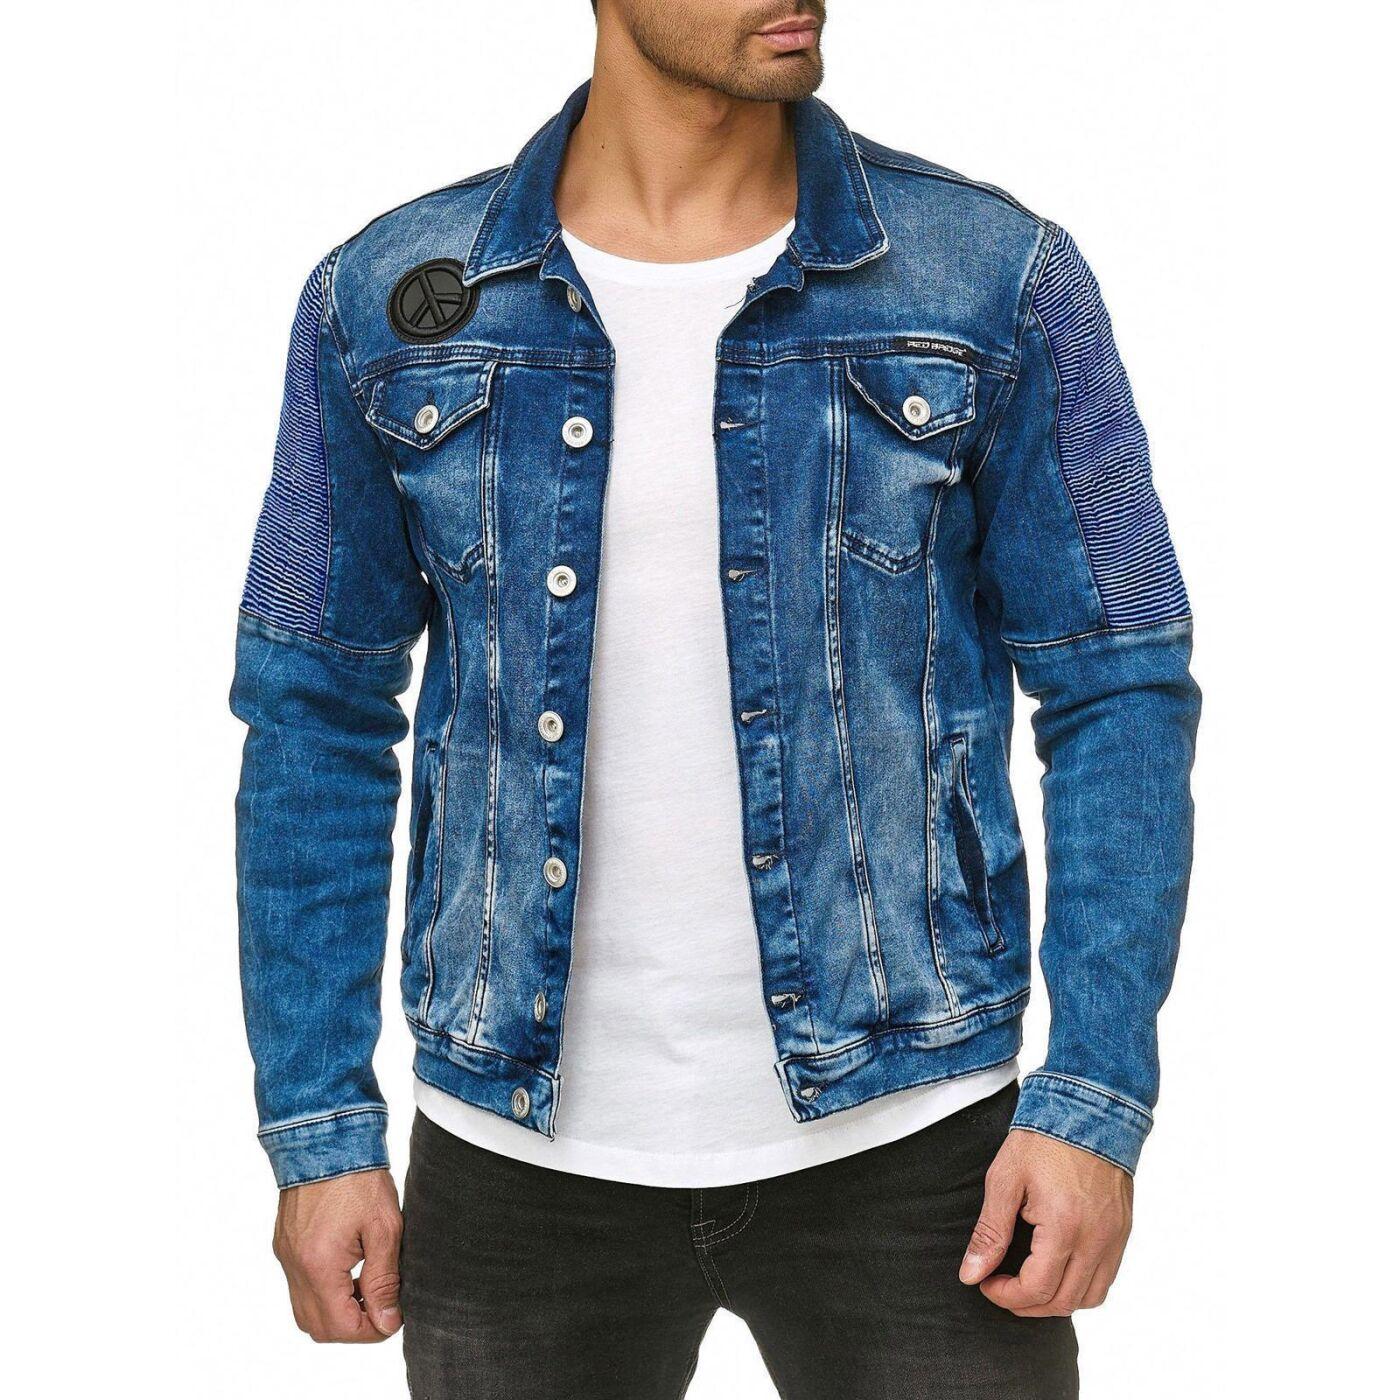 Herren Jeansjacke Gefüttert Jeans Jacke Dark Blue Denim Blau